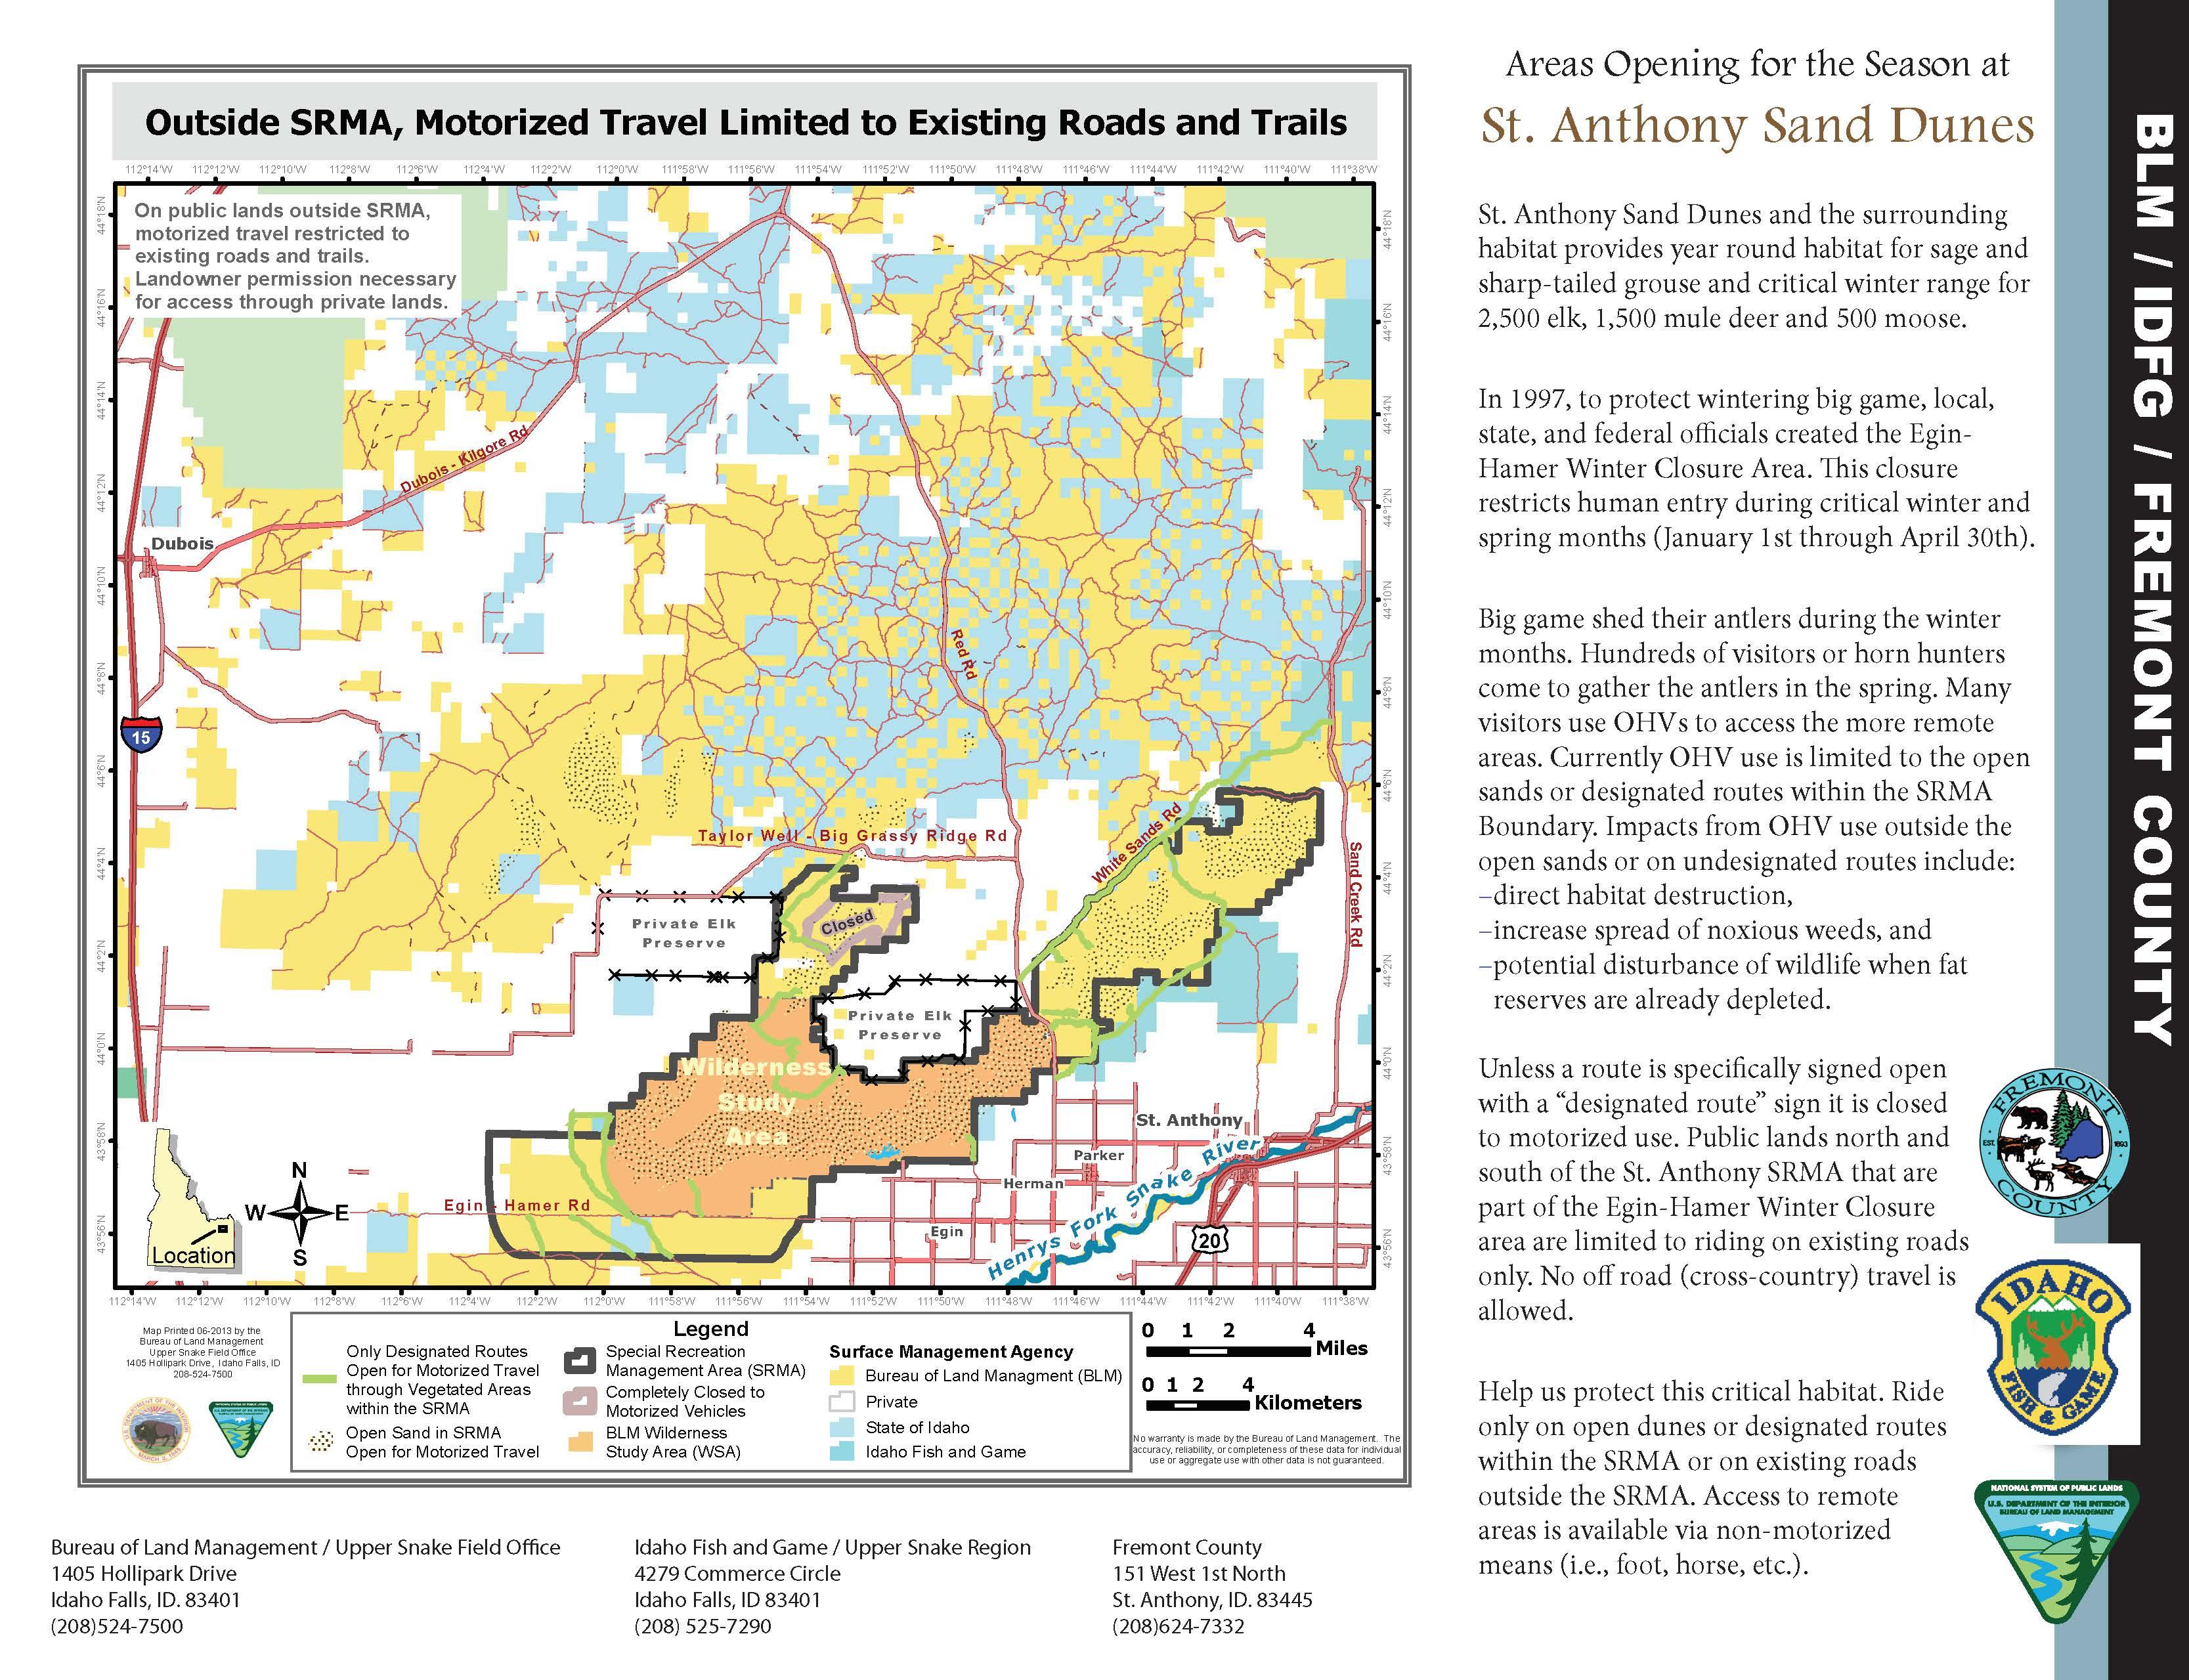 IdahoFallsDistrictOffice BUREAU OF LAND MANAGEMENT